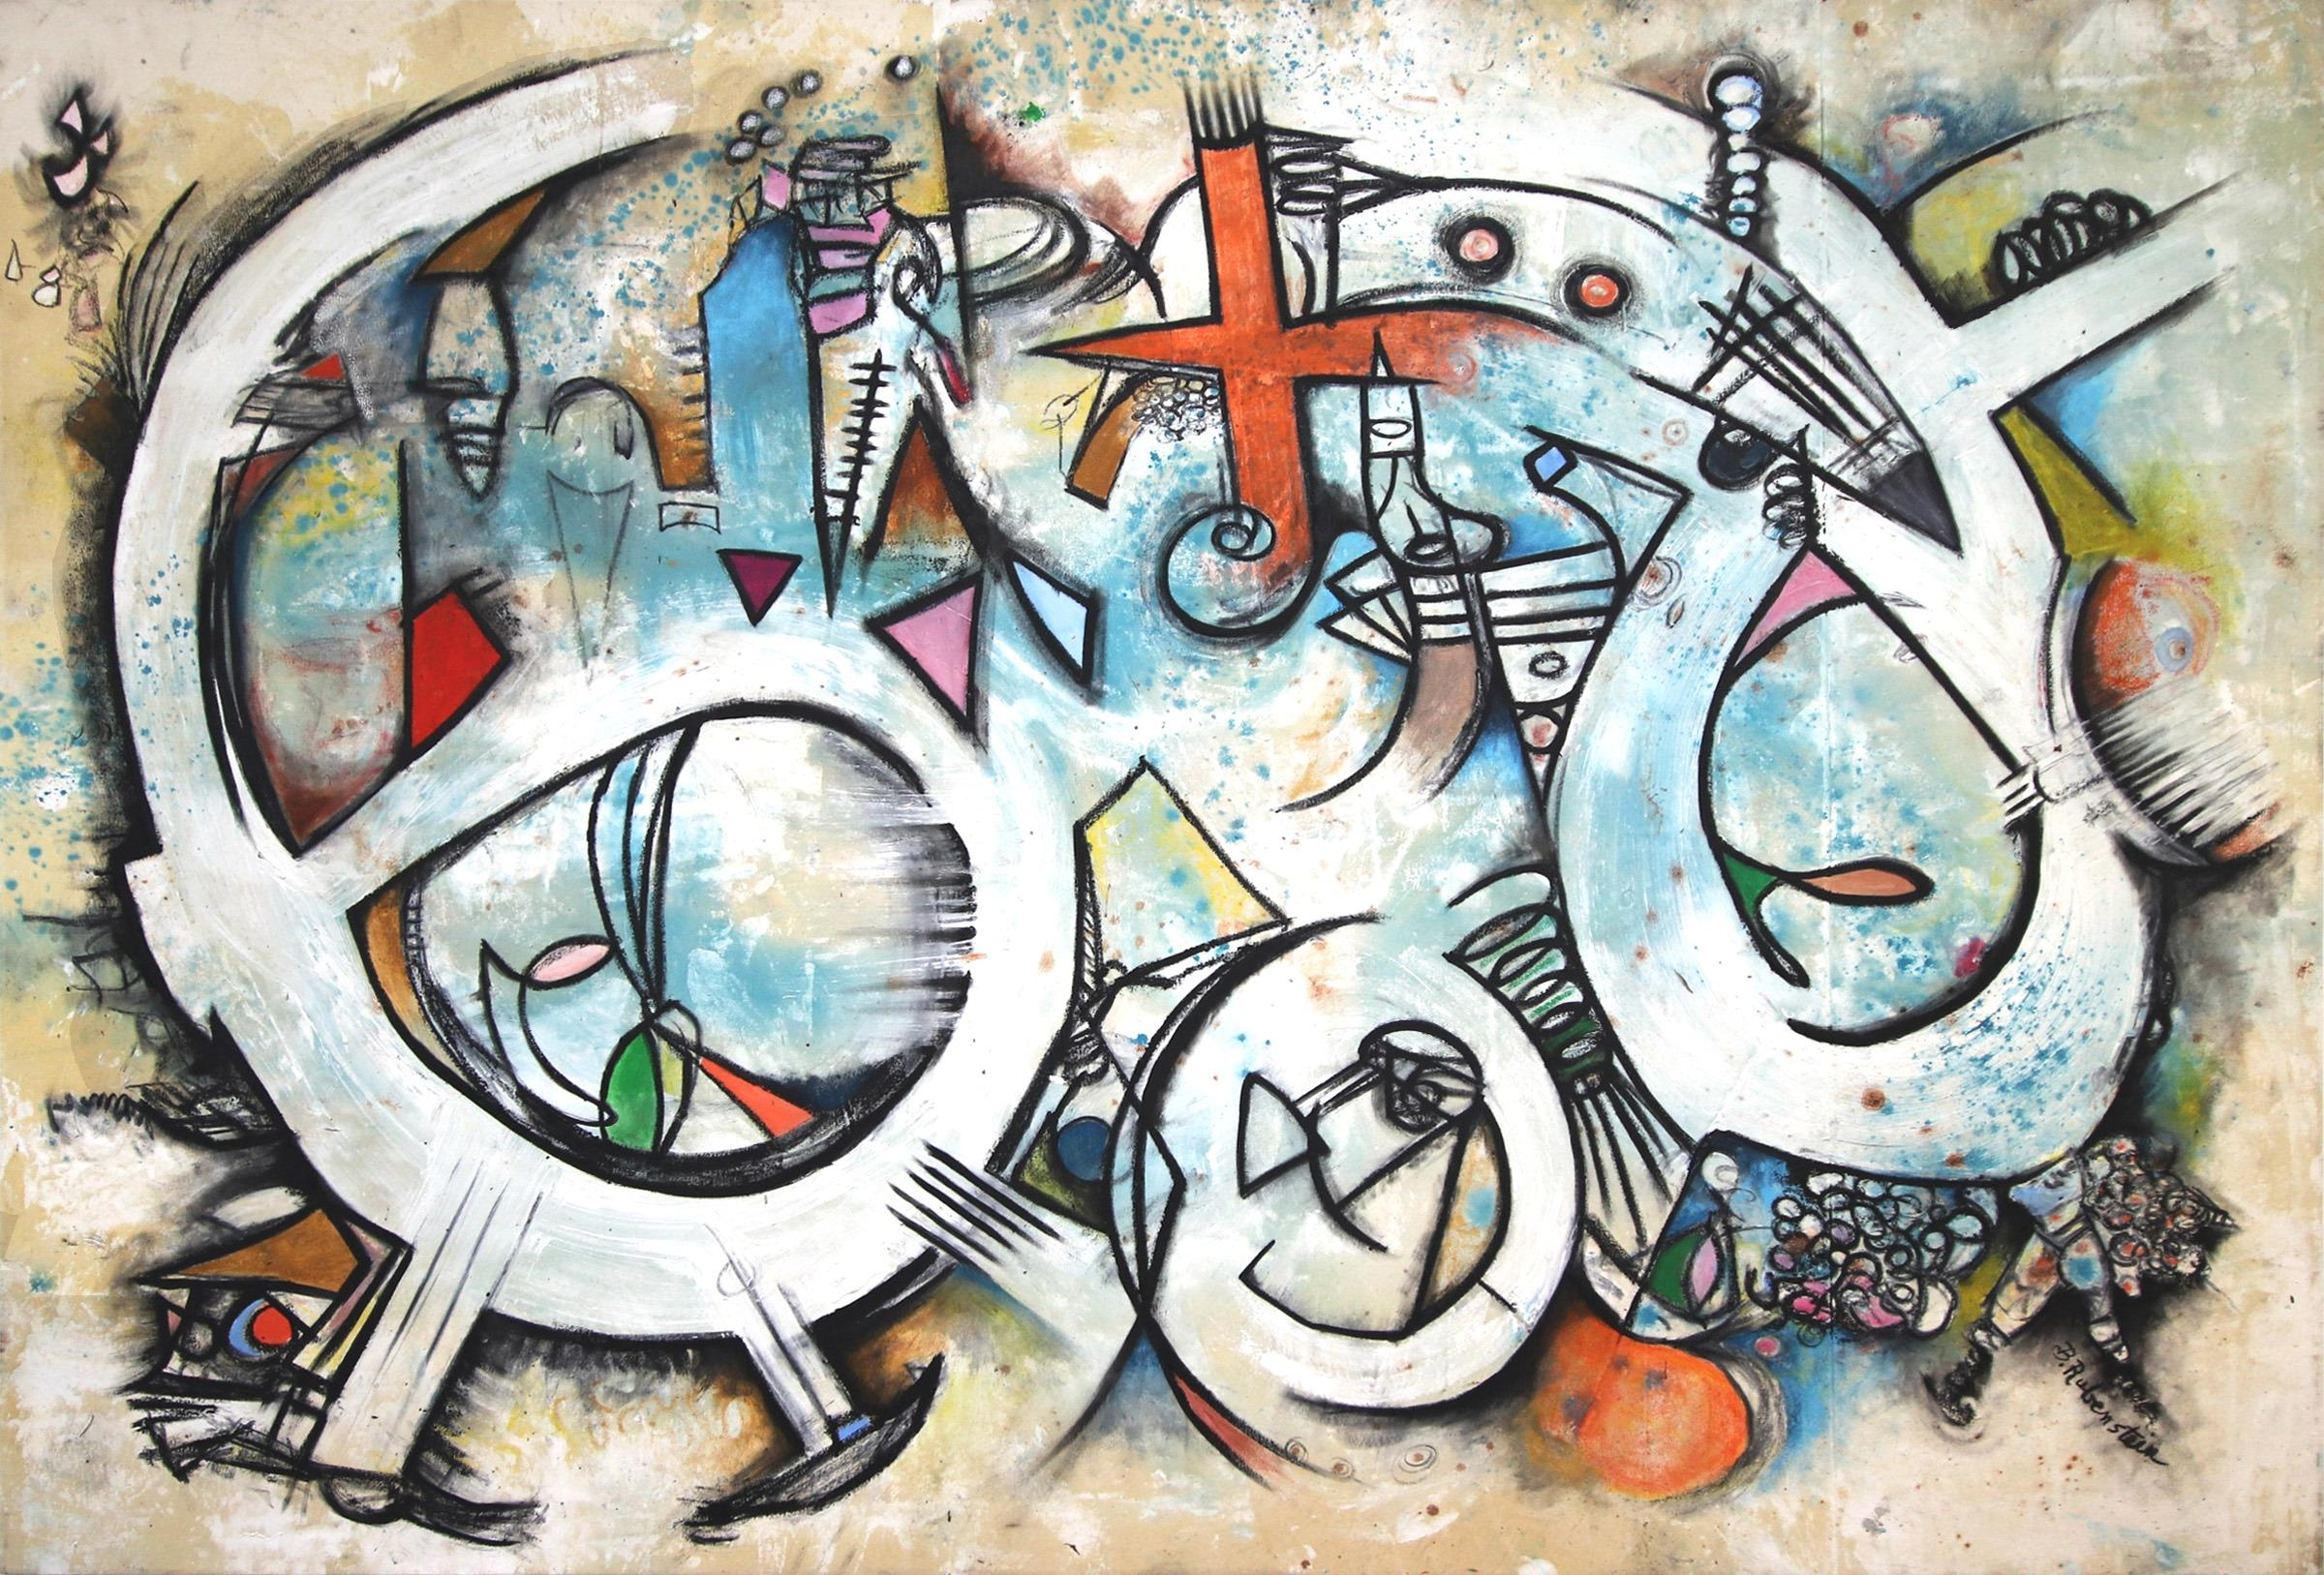 Six Sicks - large original painting